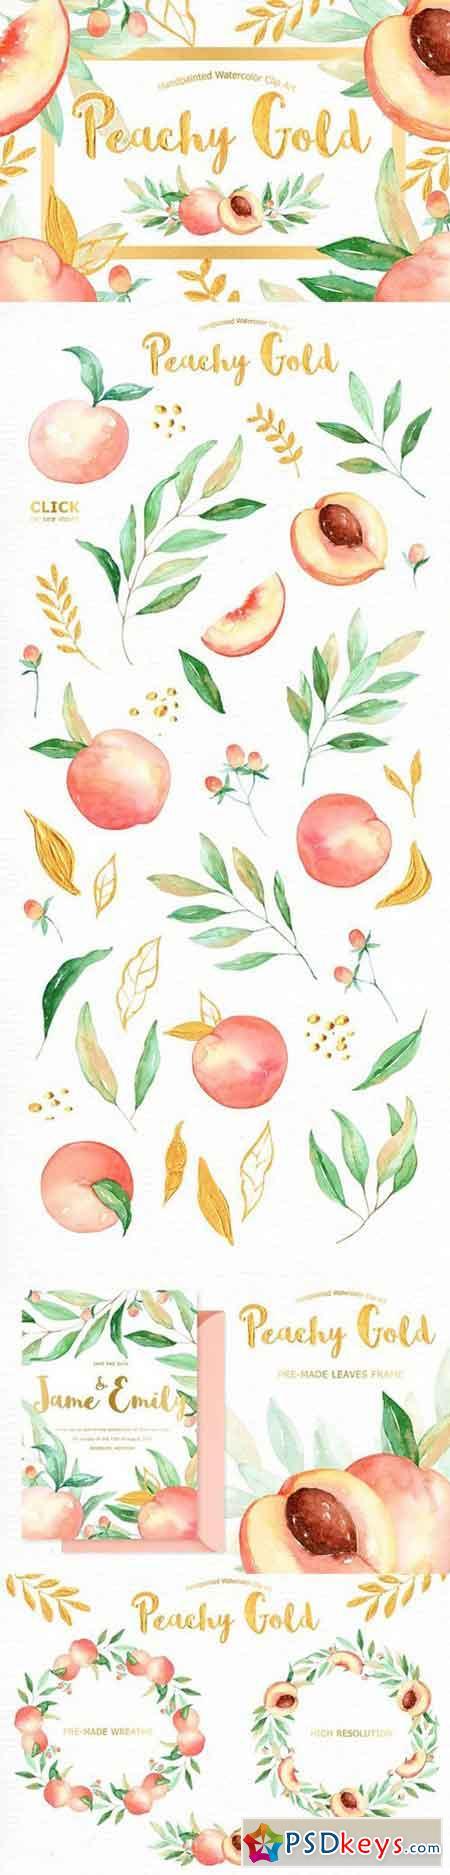 Peachy Gold Flower Clipart 1277304